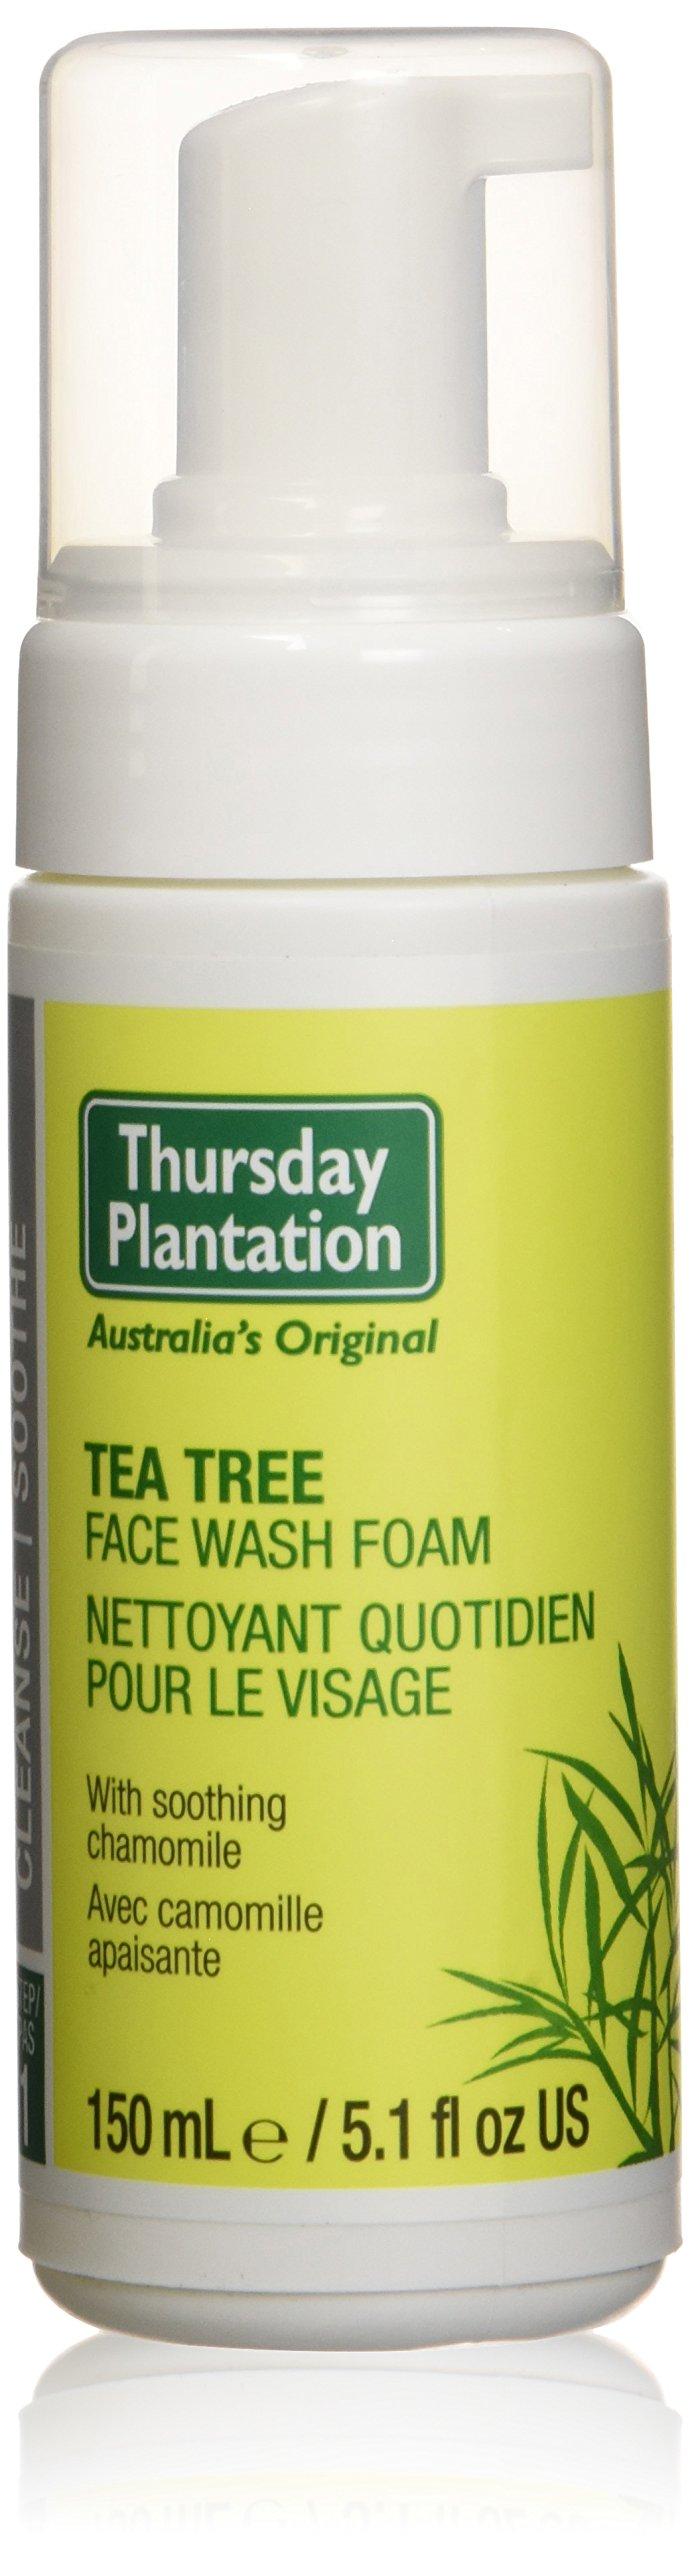 Tea Tree Face Wash Foam Thursday Plantation 5.1 fl oz Liquid